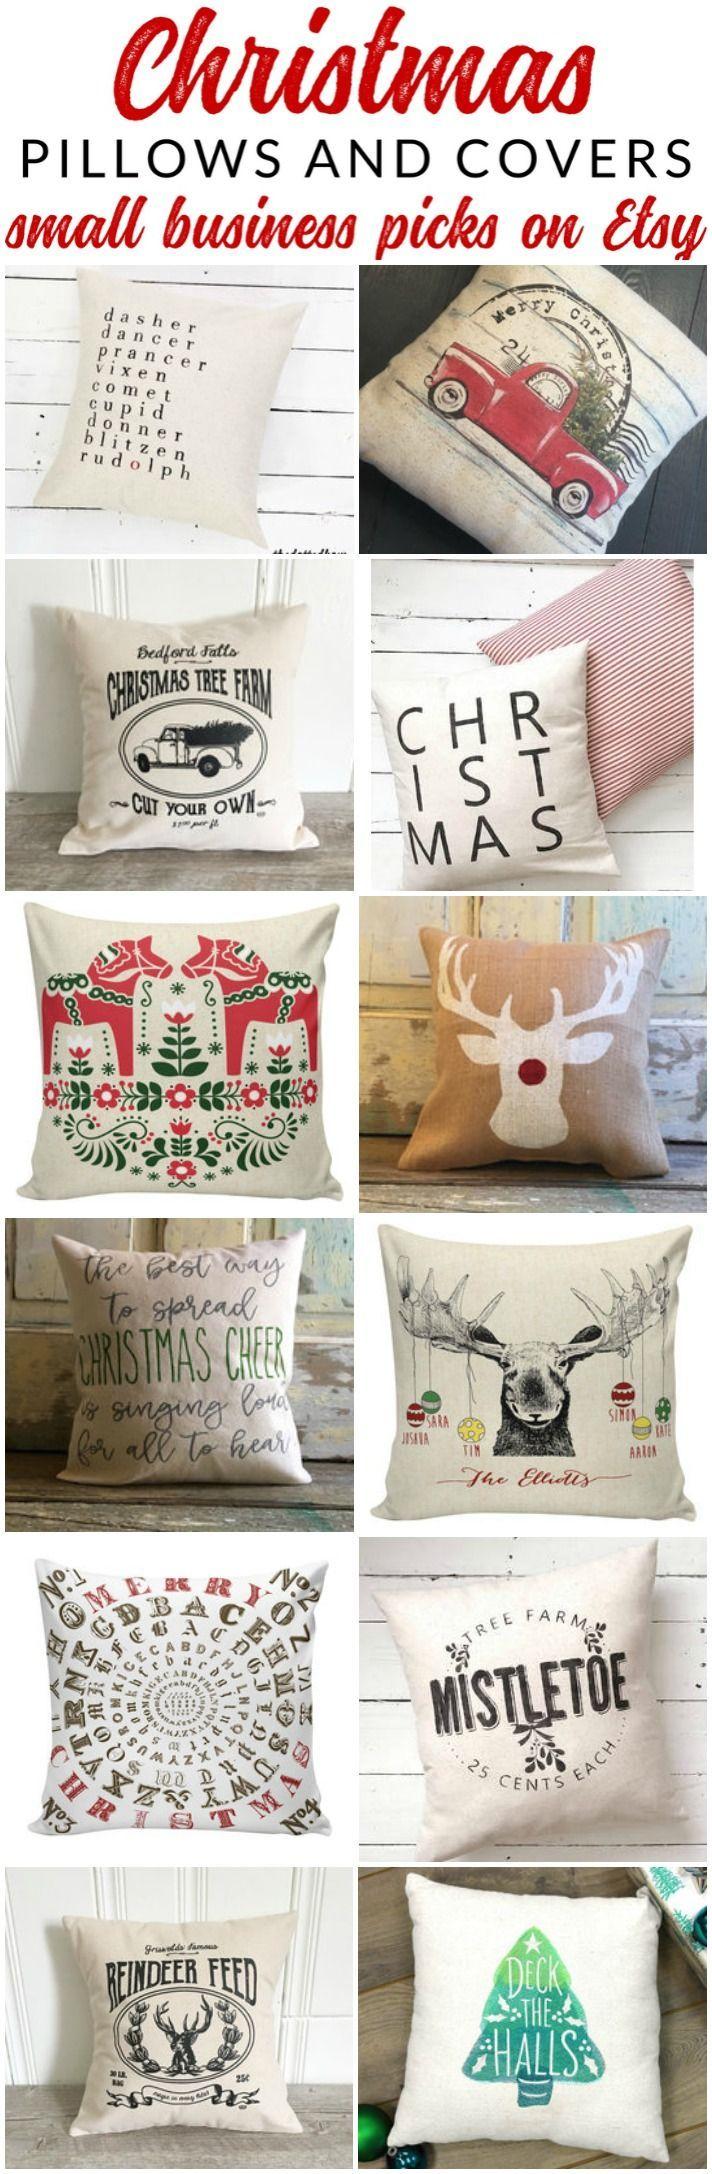 Farmhouse Style Christmas Pillows on Etsy 253